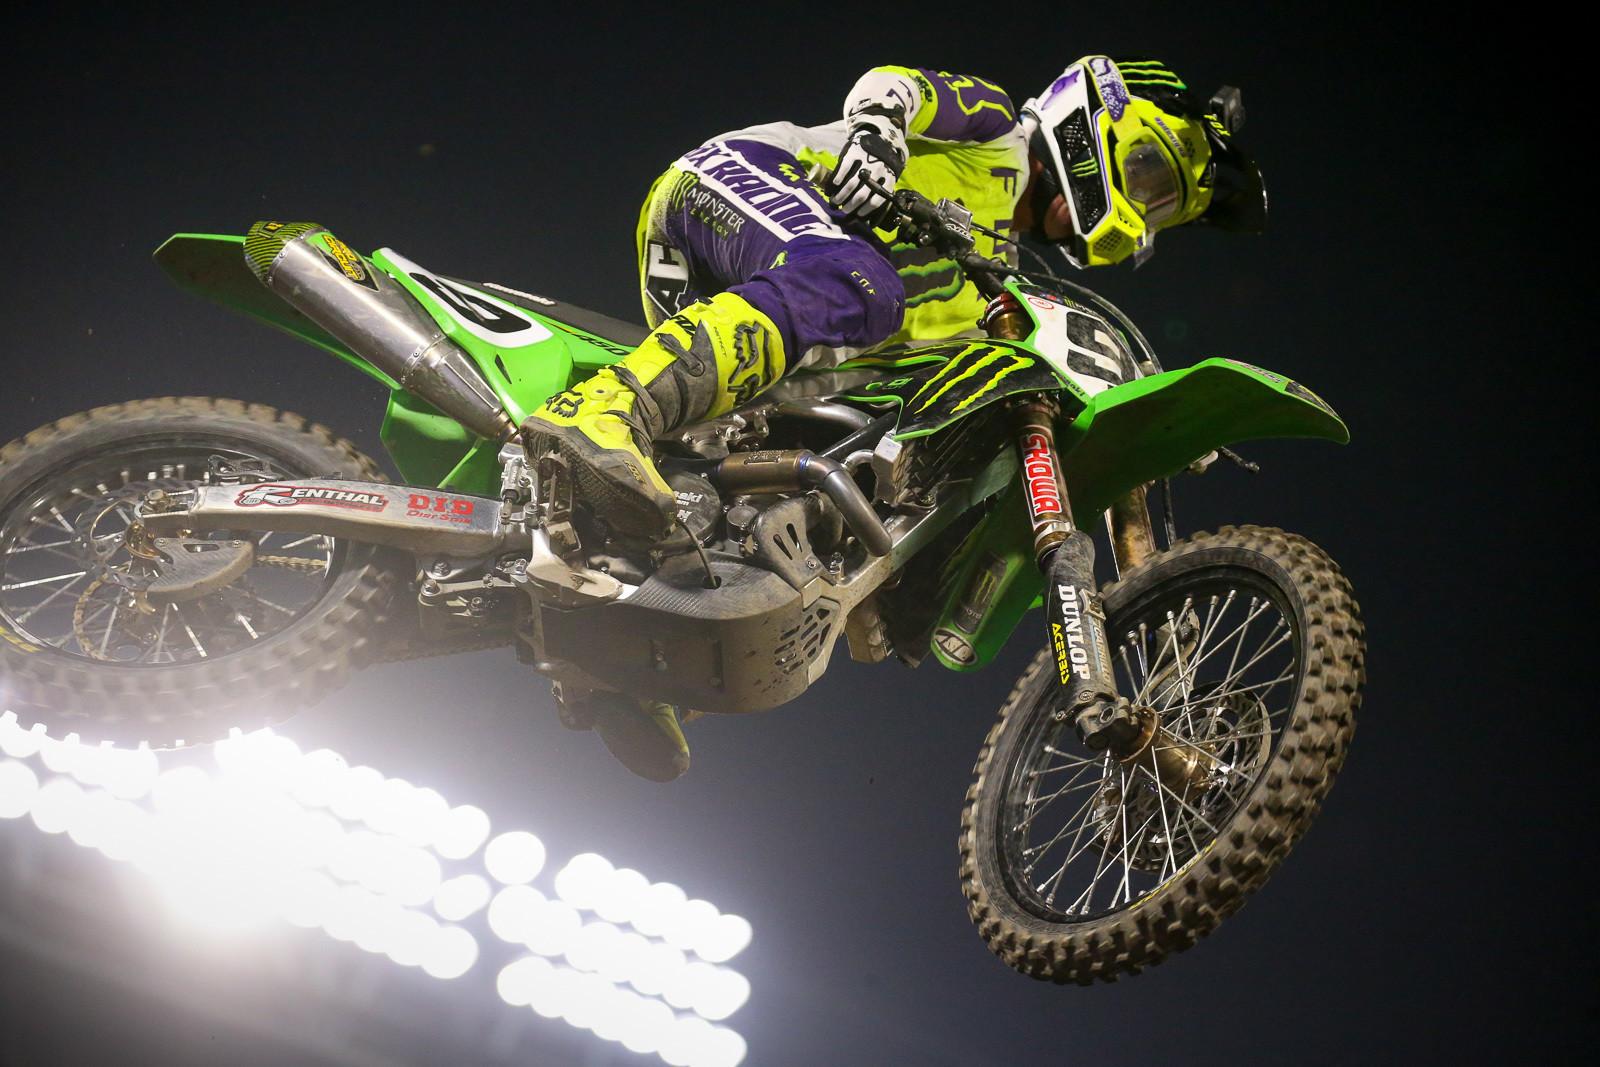 2020 Anaheim 1 Supercross.